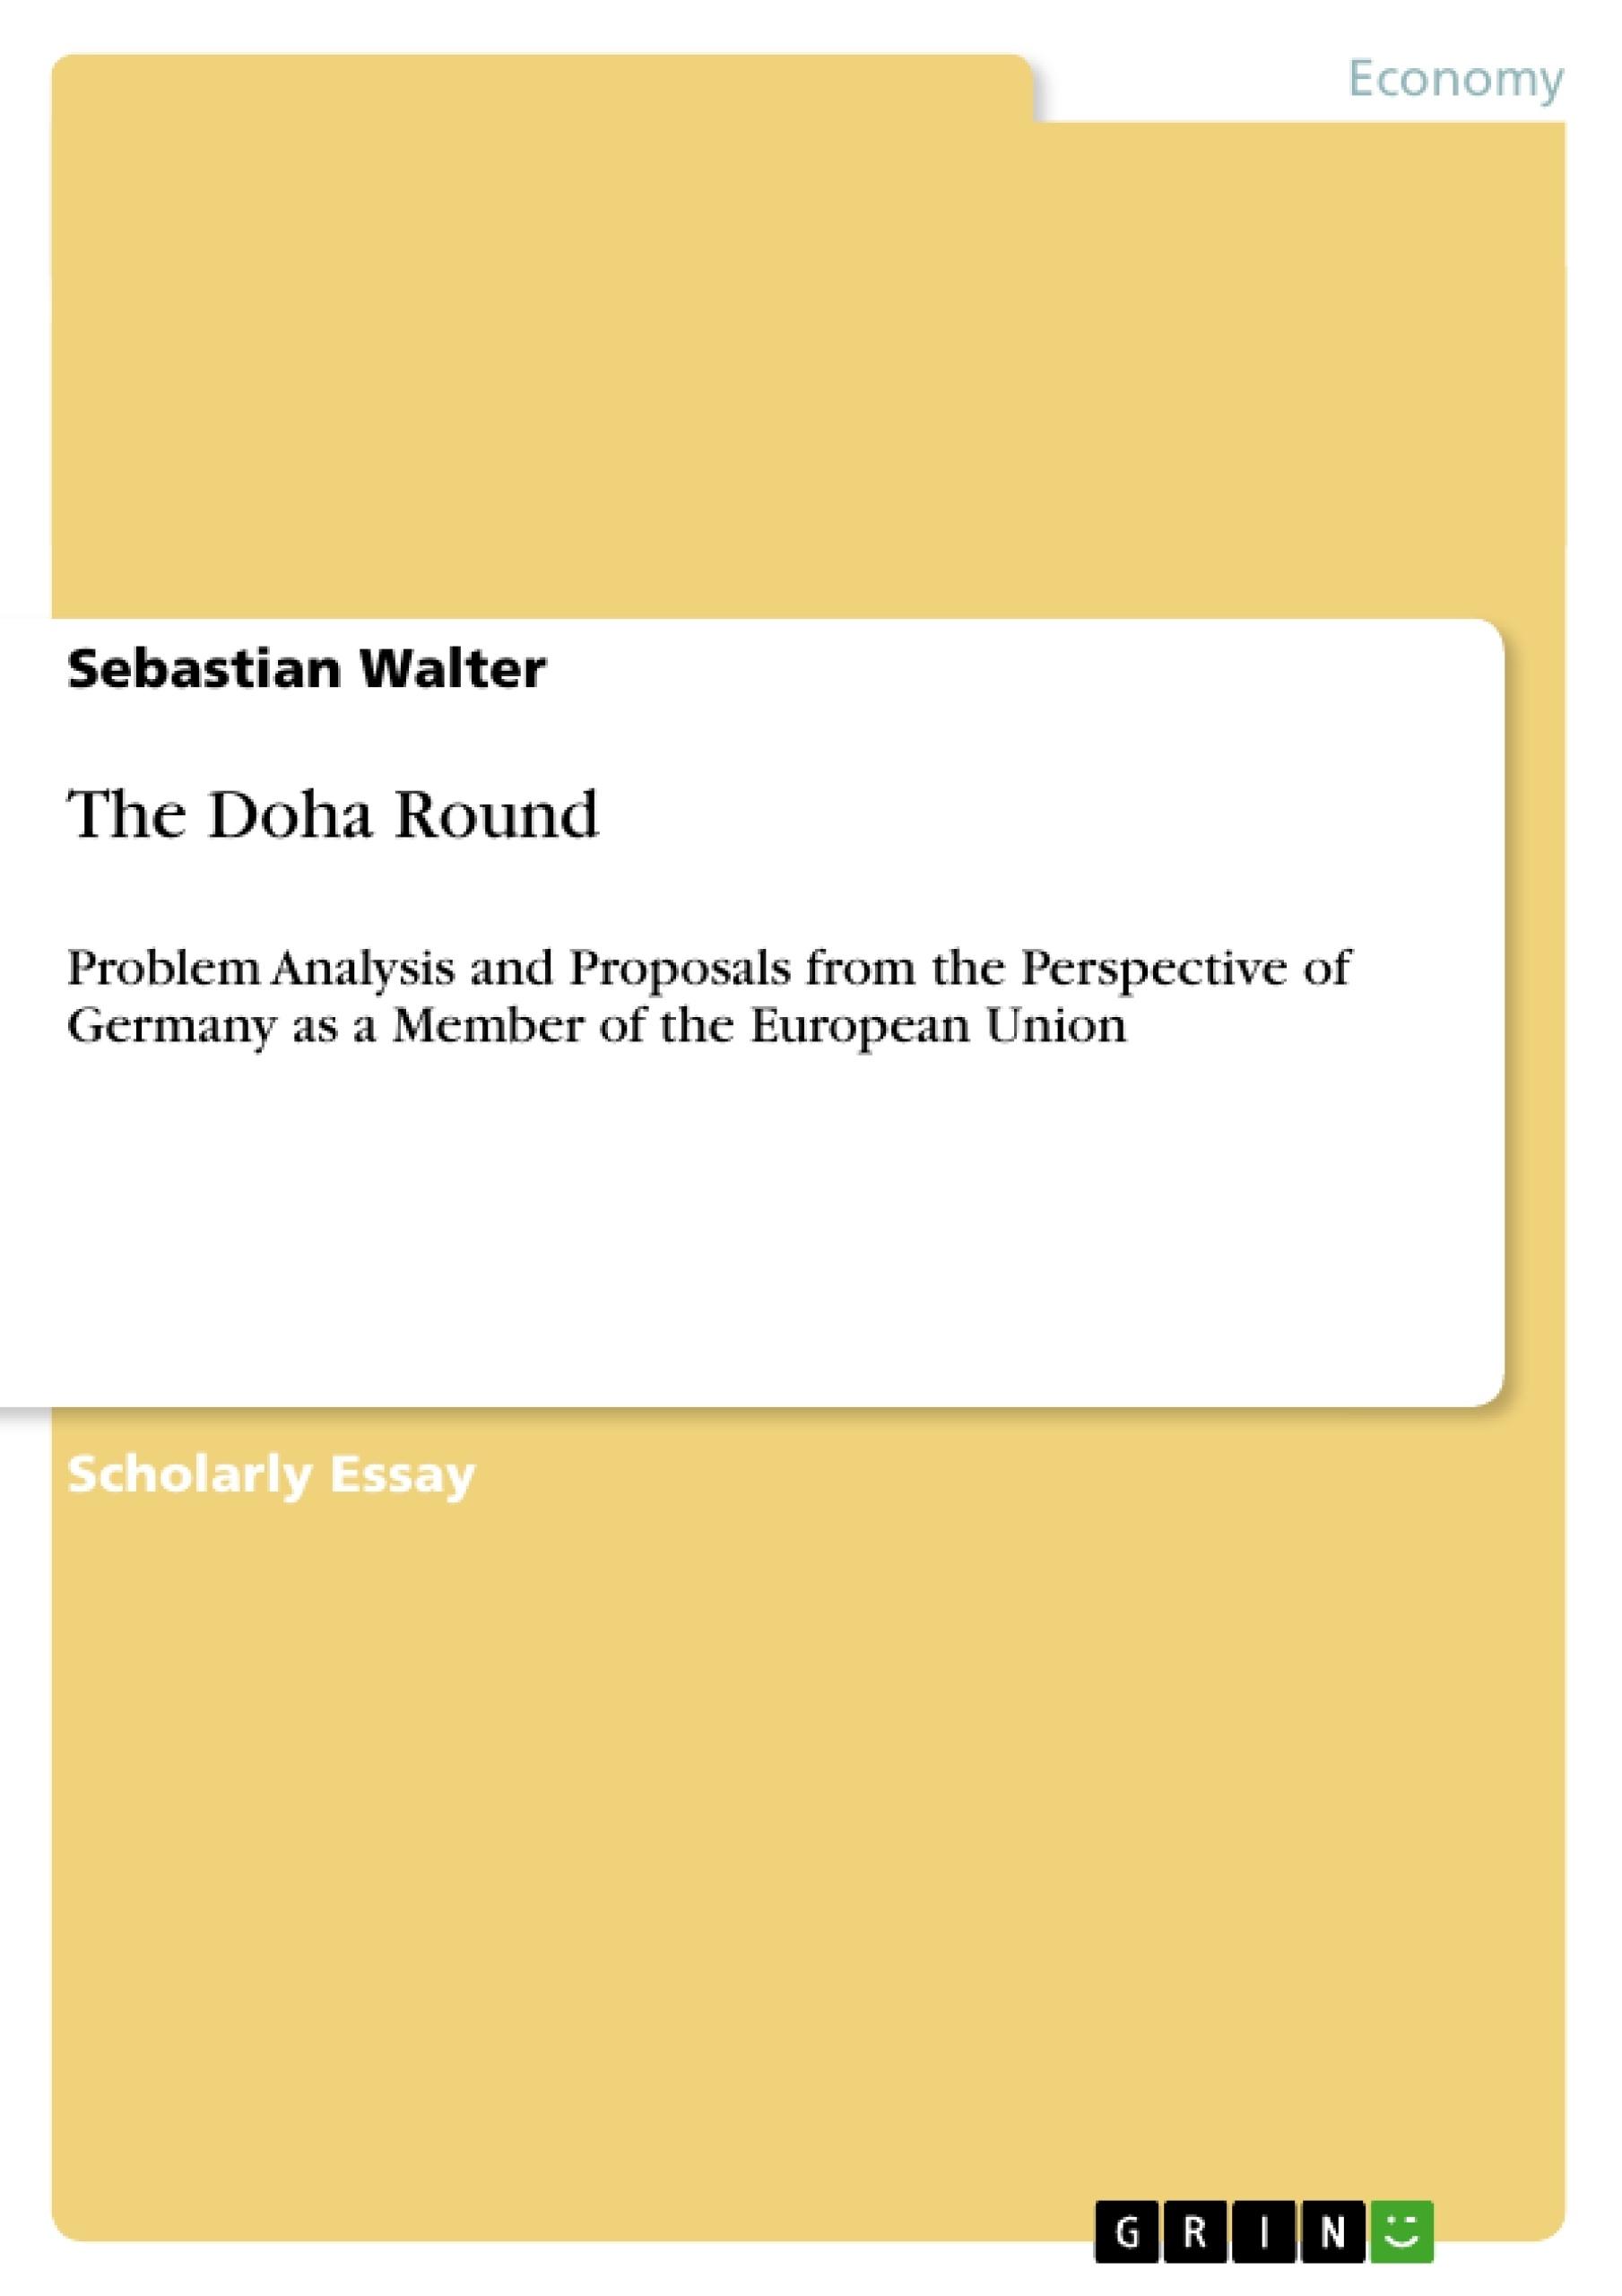 Title: The Doha Round